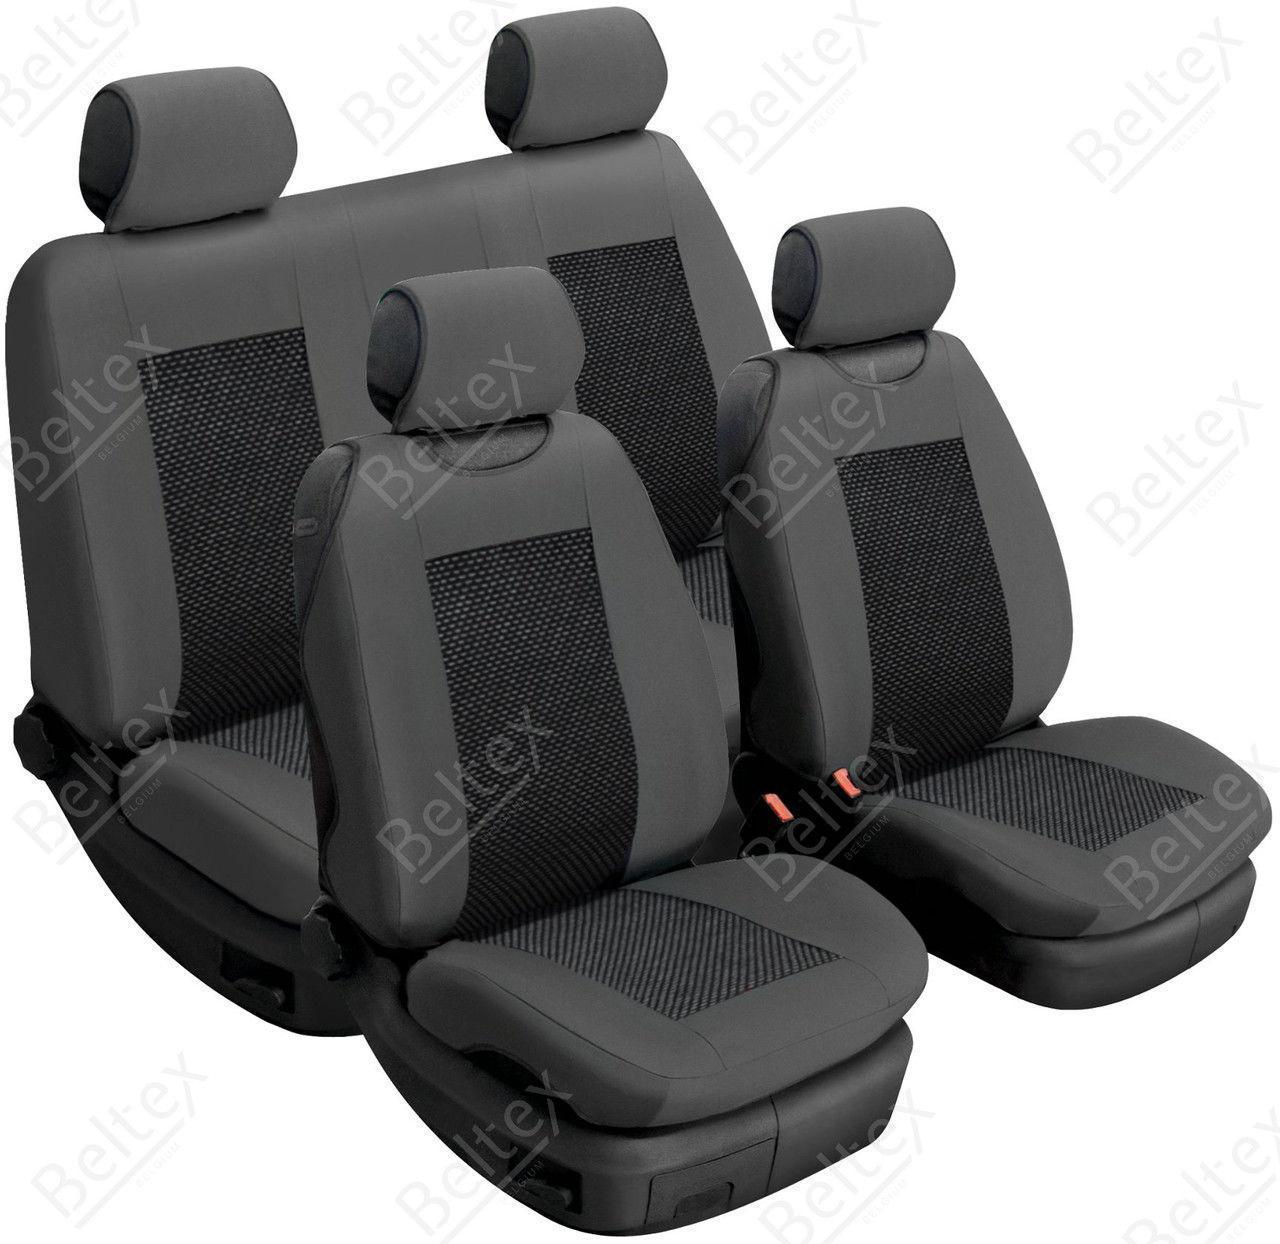 Майки/чехлы на сиденья Джип Либерти (Jeep Liberty)